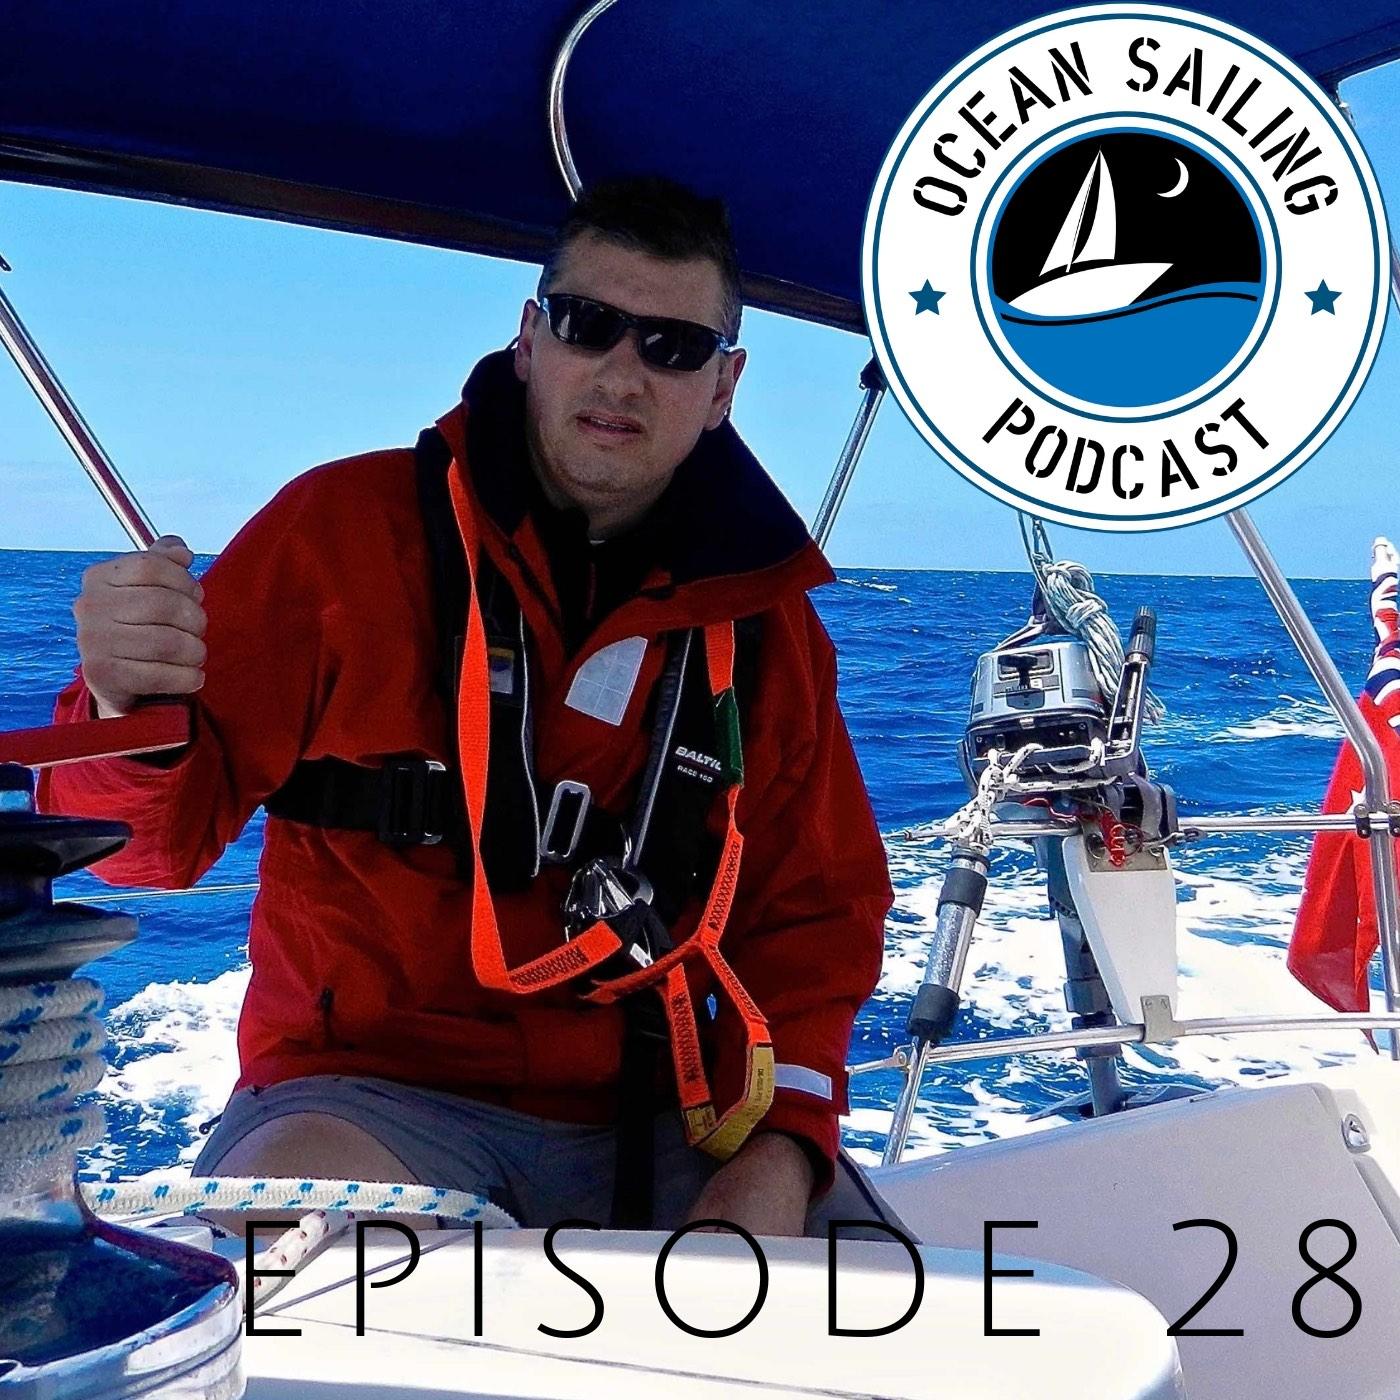 Sailing the Tasman Sea Part 2 Episode 28.jpg